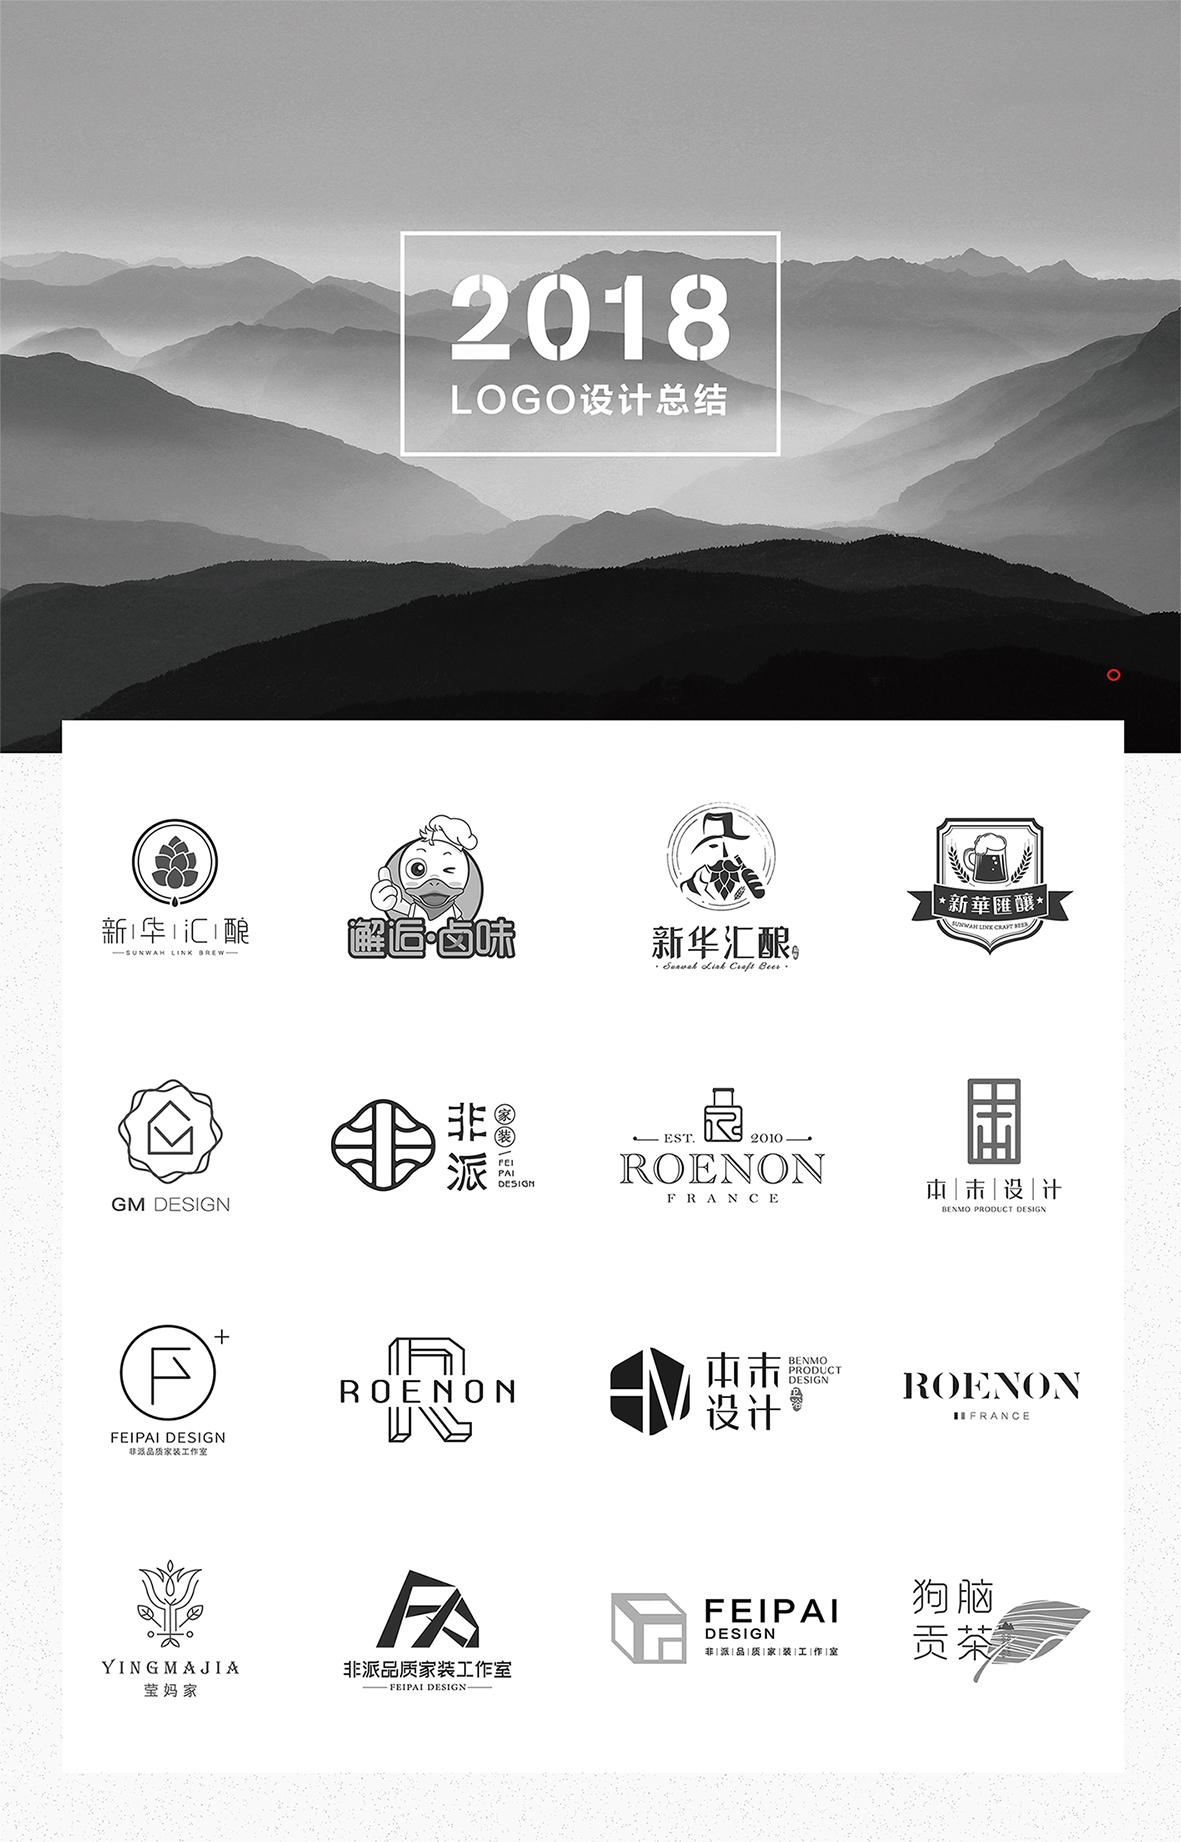 2018 | LOGO总结